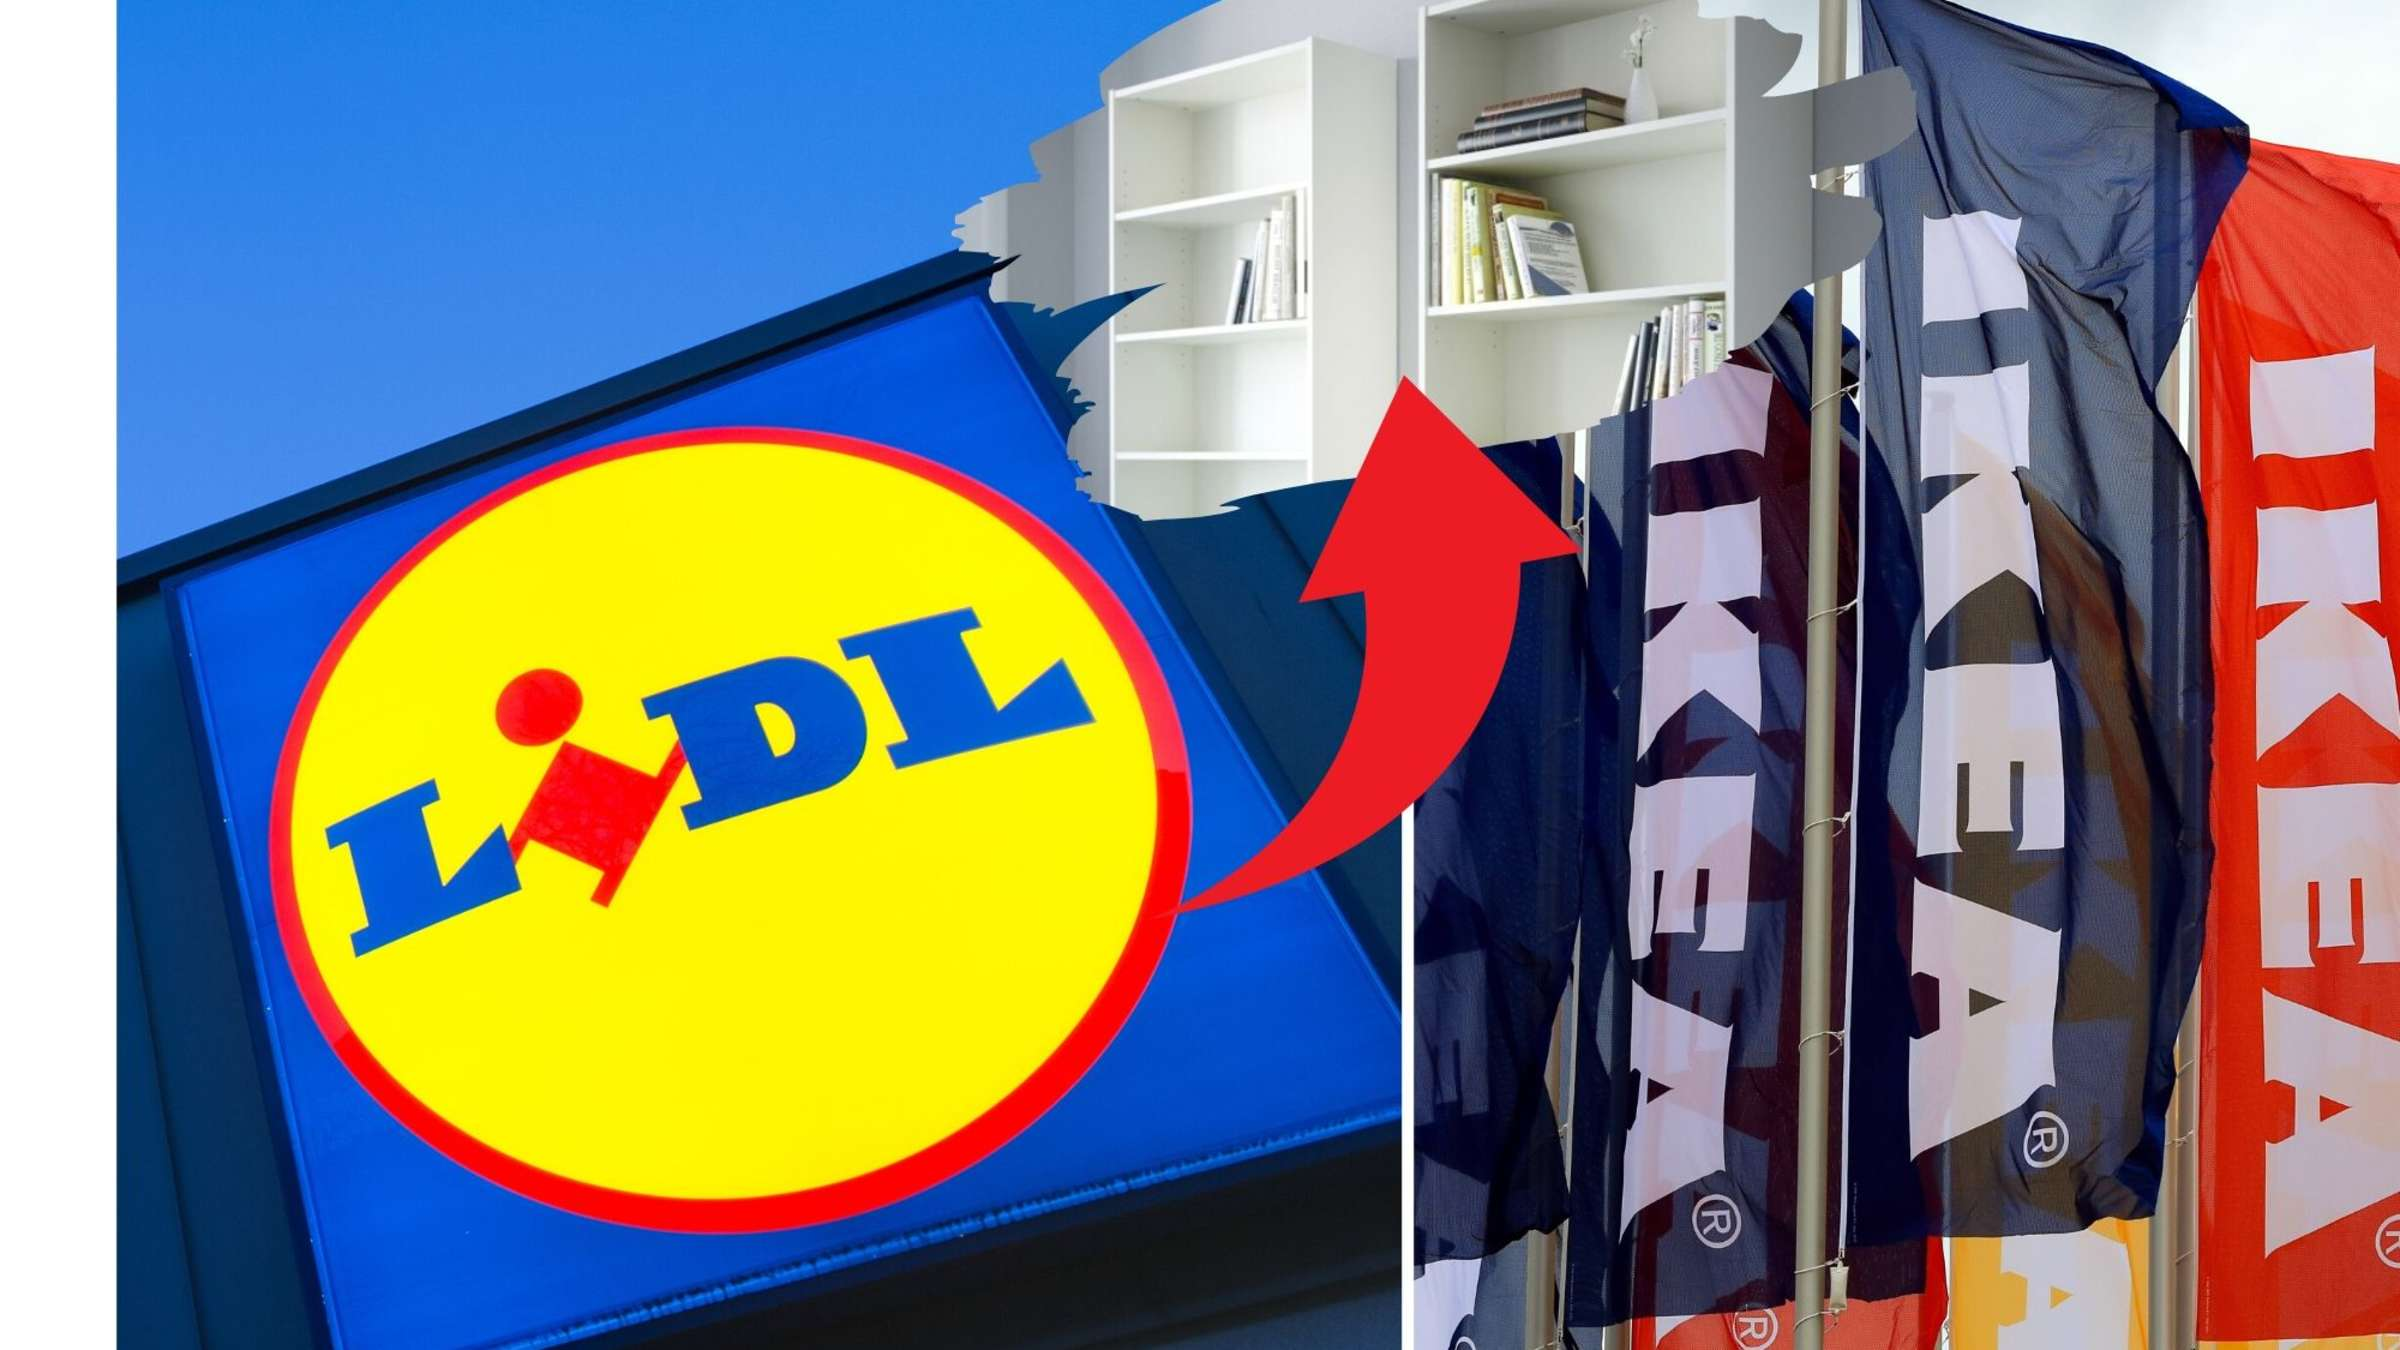 Full Size of Combine Modulregal Lidl Gegen Ikea Discounter Provoziert Mit Werbung Zu Neuem Regal Wohnzimmer Combine Modulregal